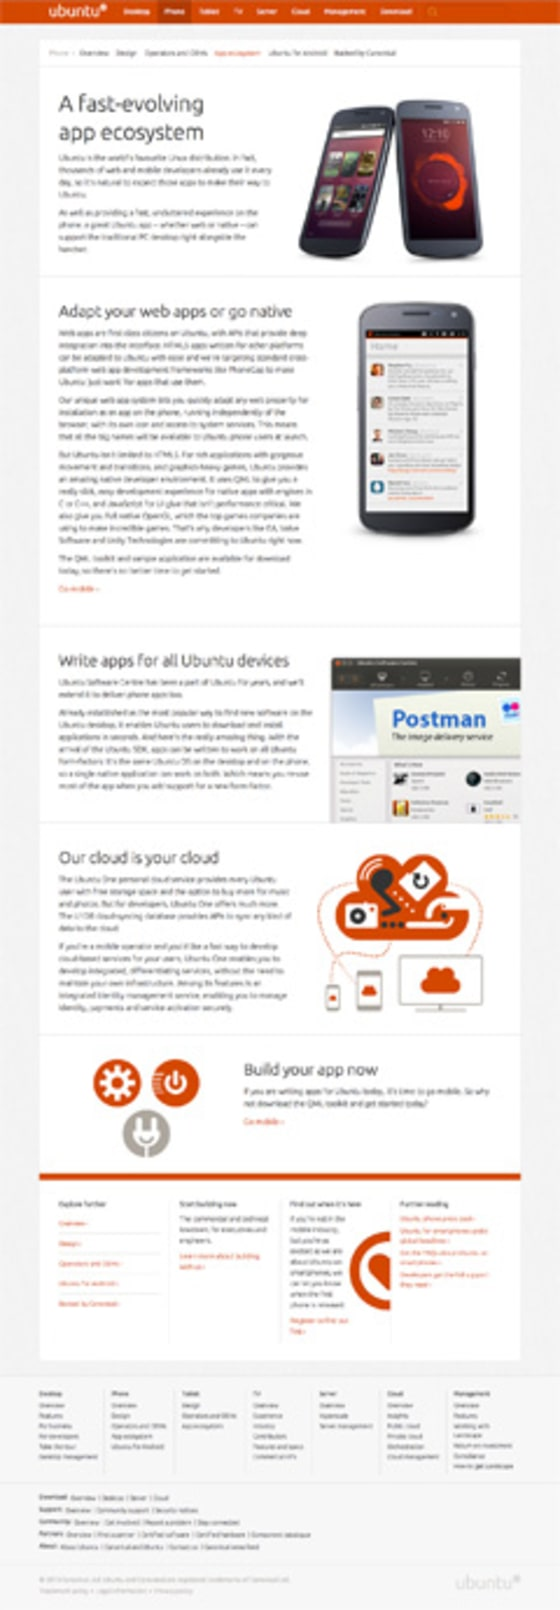 Ubuntu.com phone page